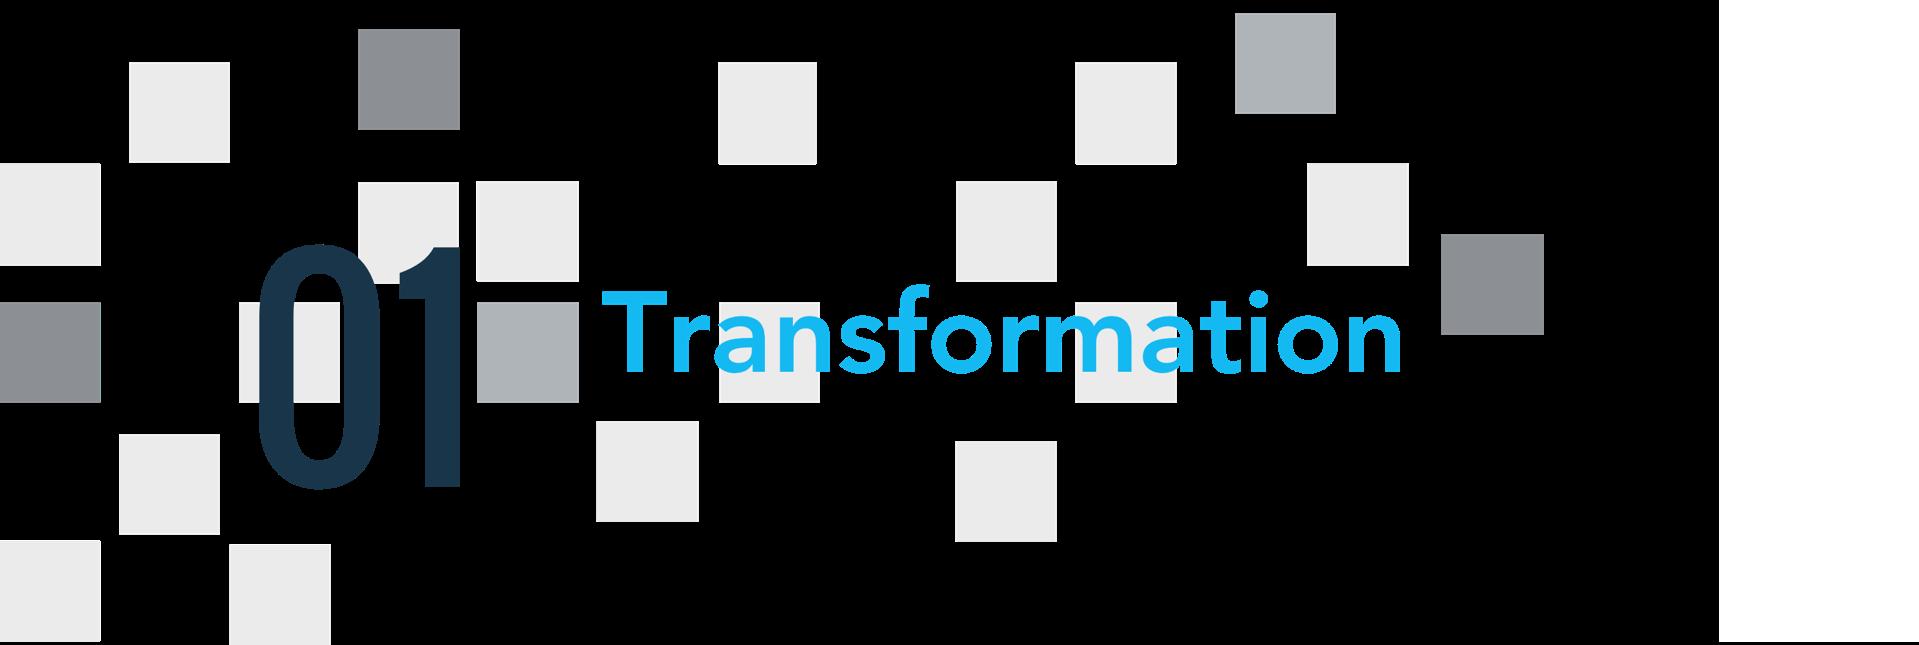 01 transformation